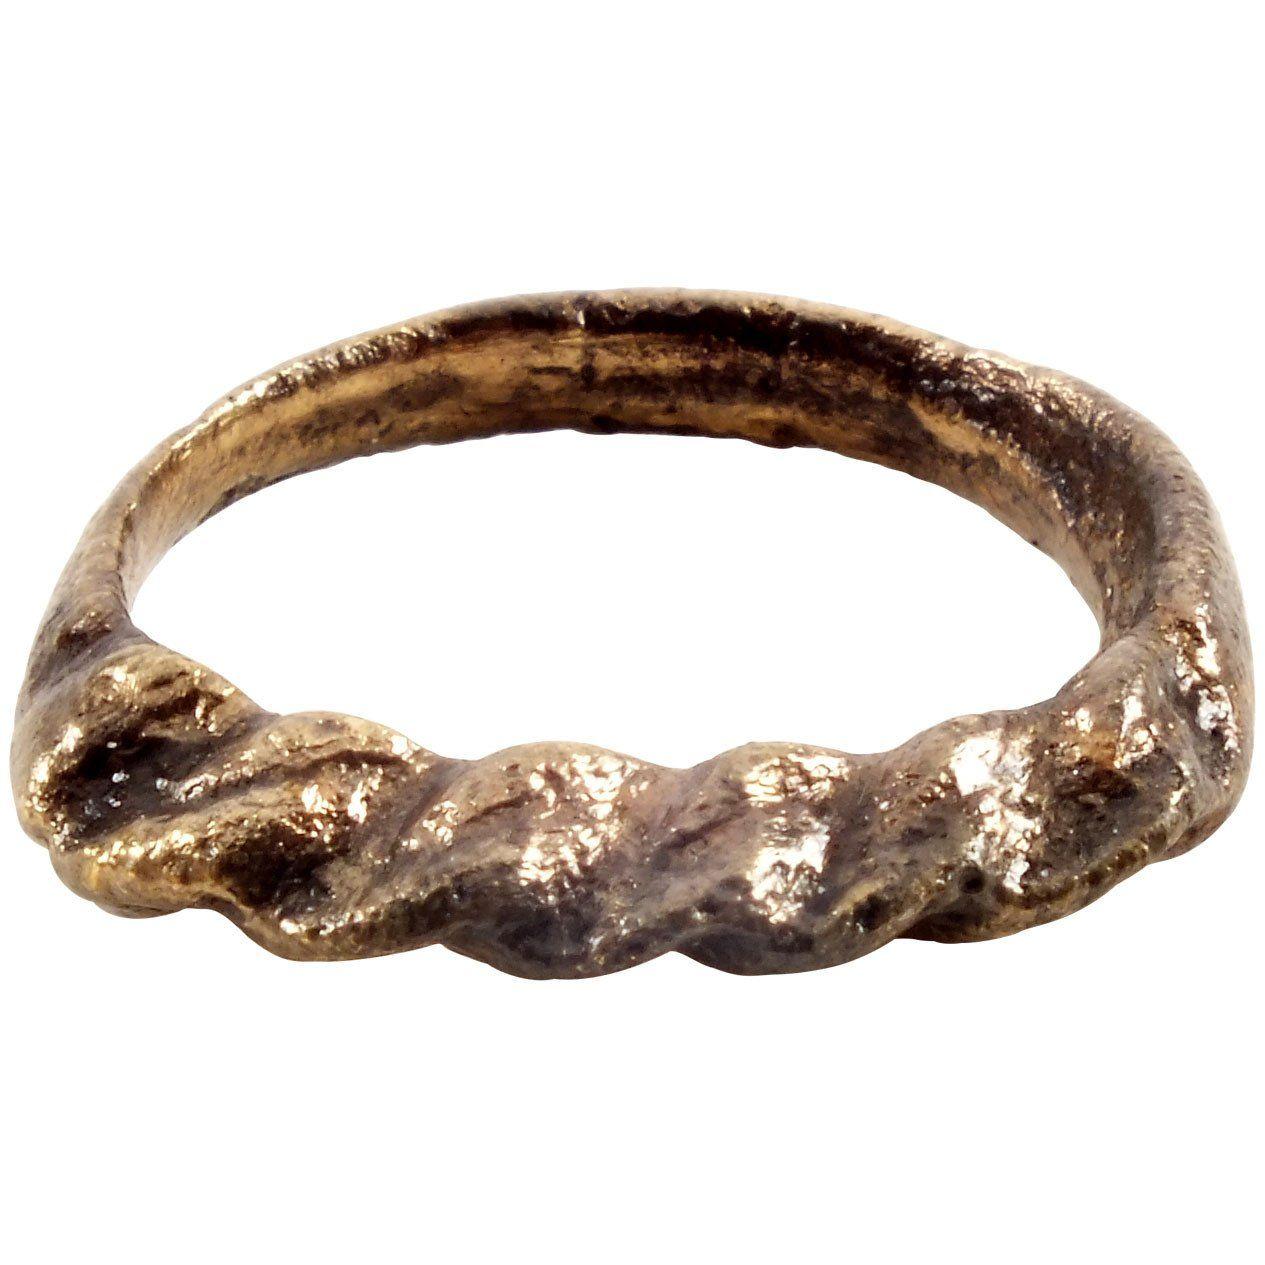 VIKING TWISTED RING C.8501050 AD Twist ring, Viking